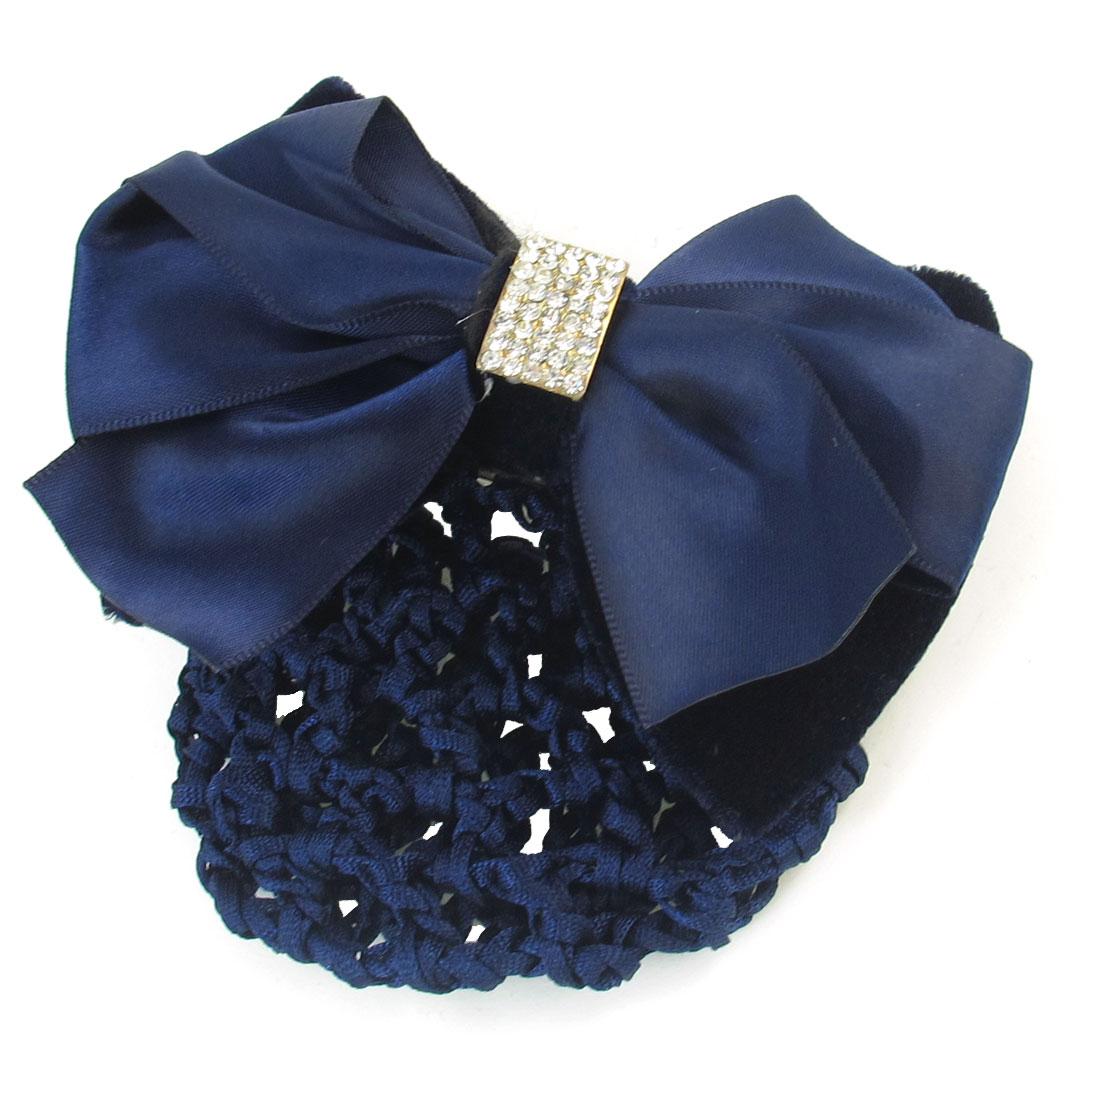 Rhinestones Bowtie Decor Navy Blue Barrette Hair Clip Snood Net for Women